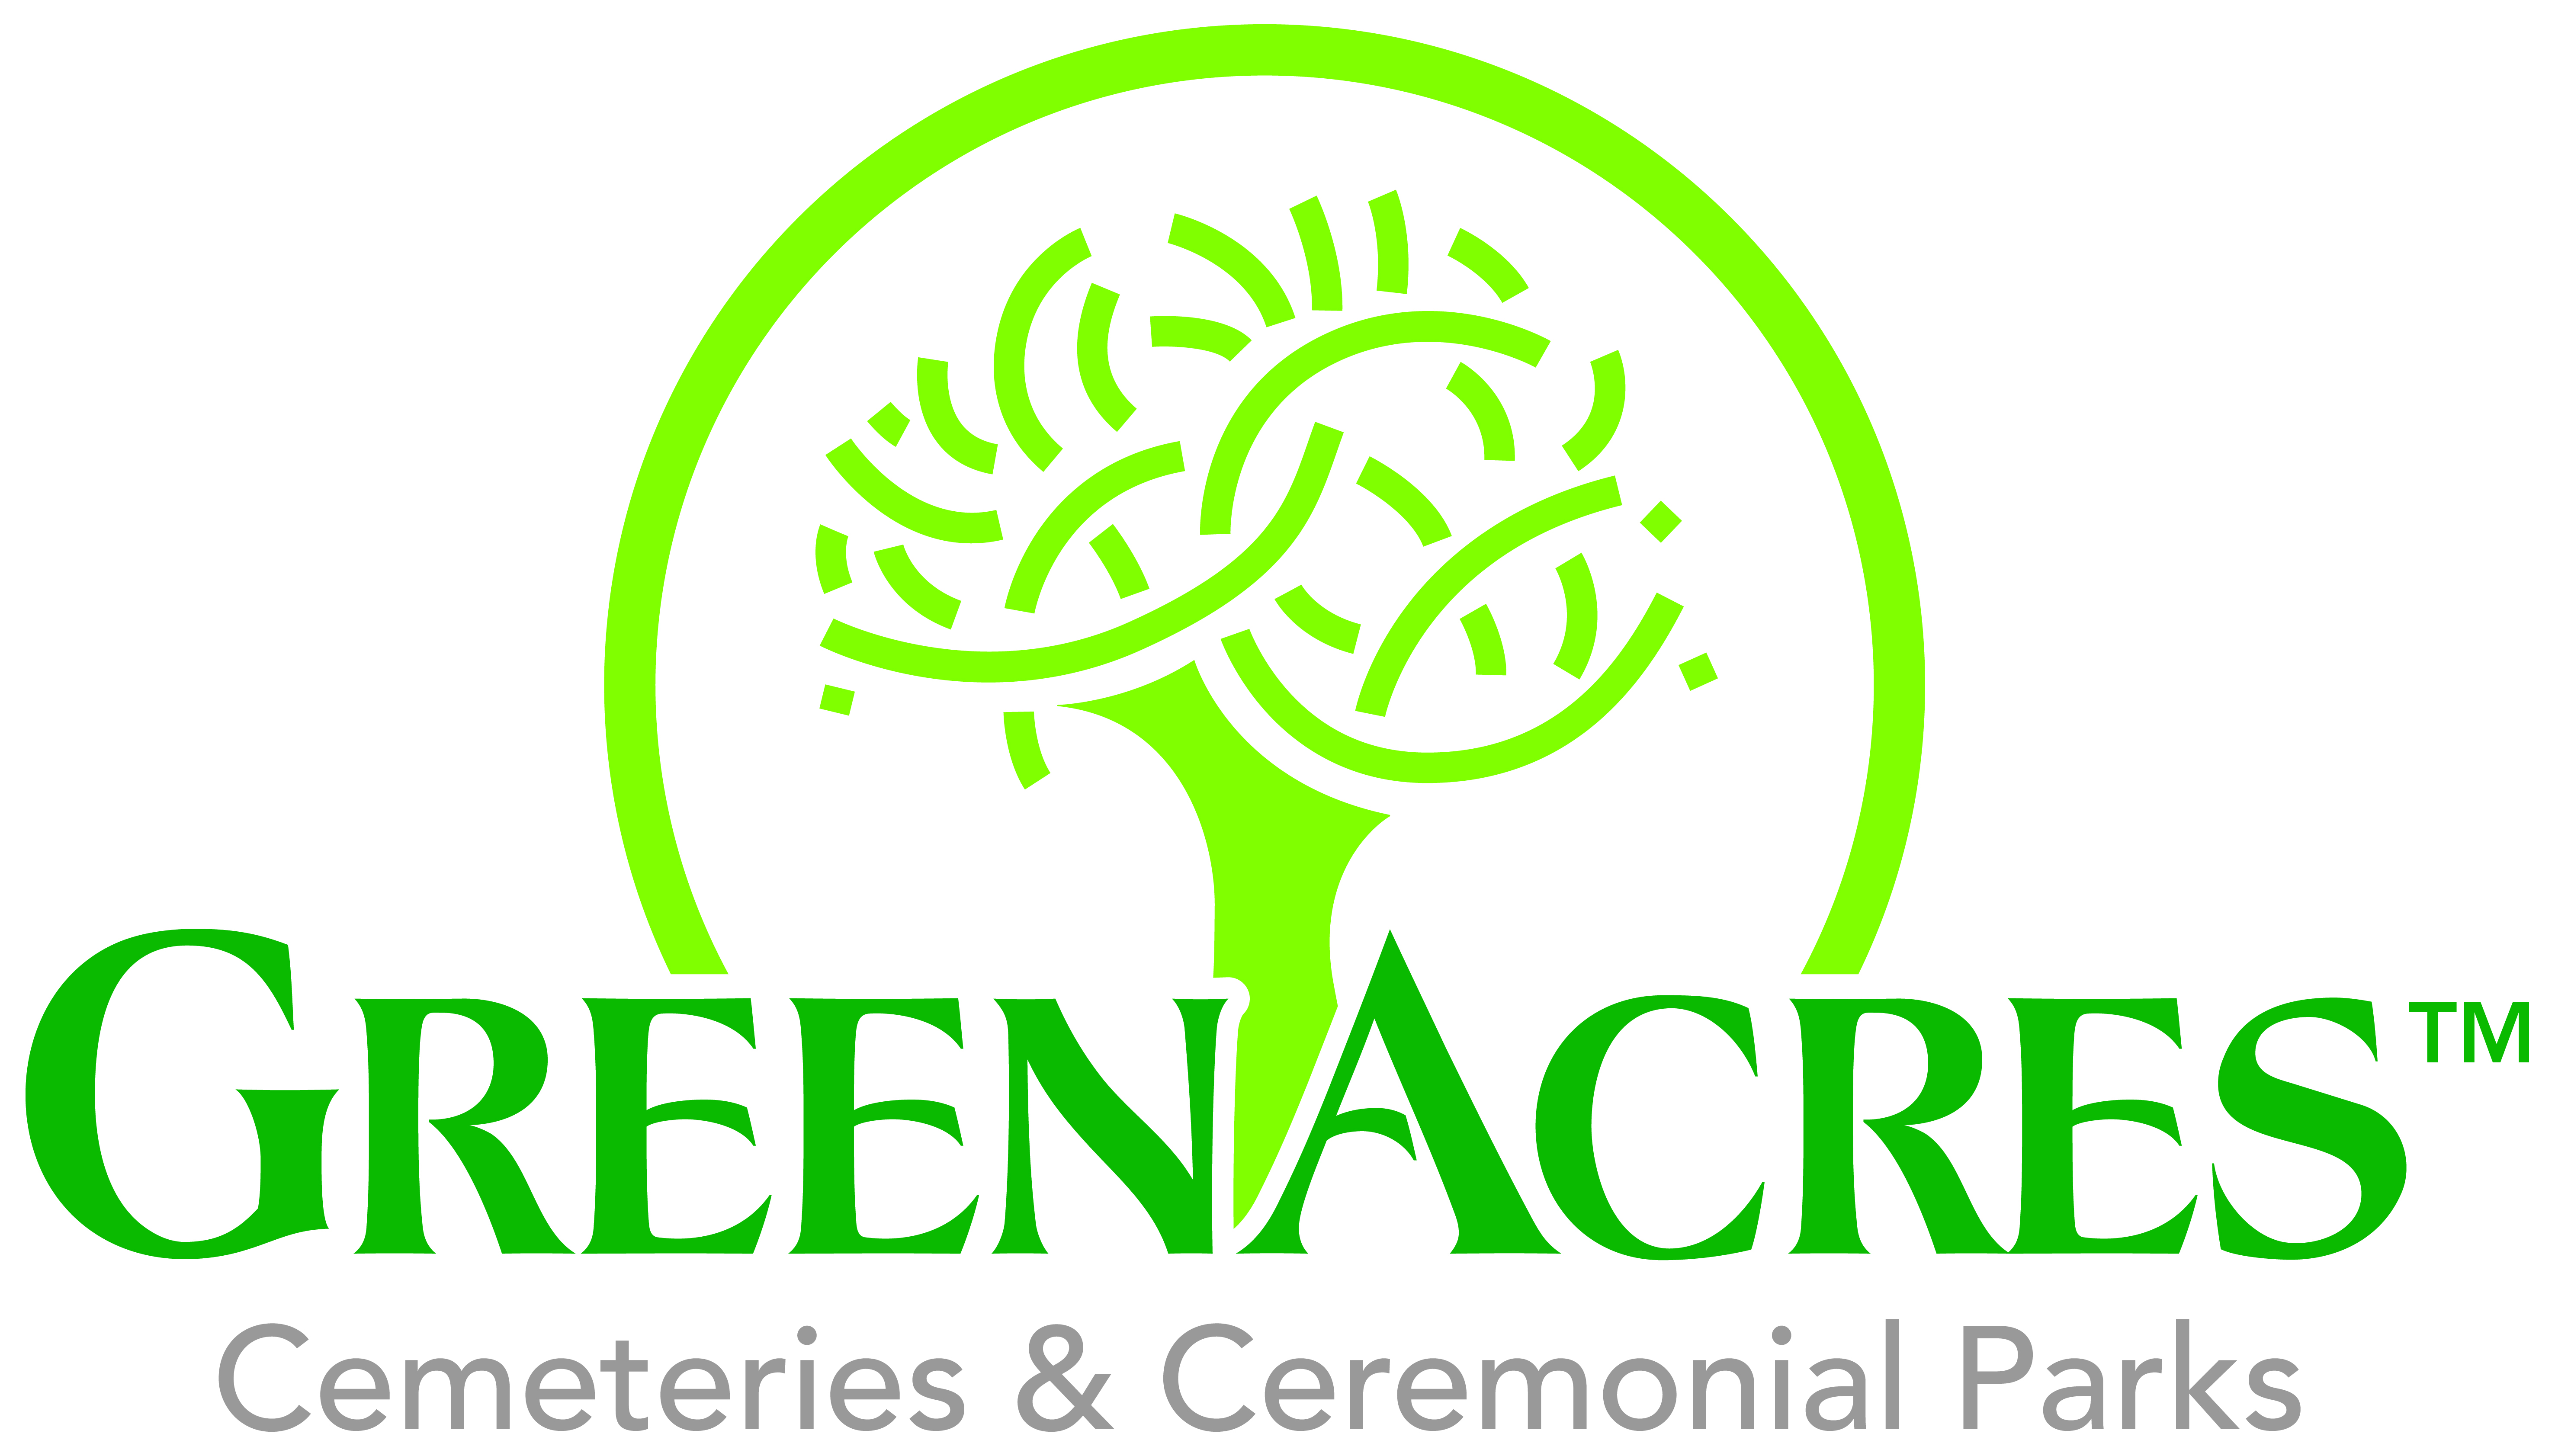 Greenacres Group